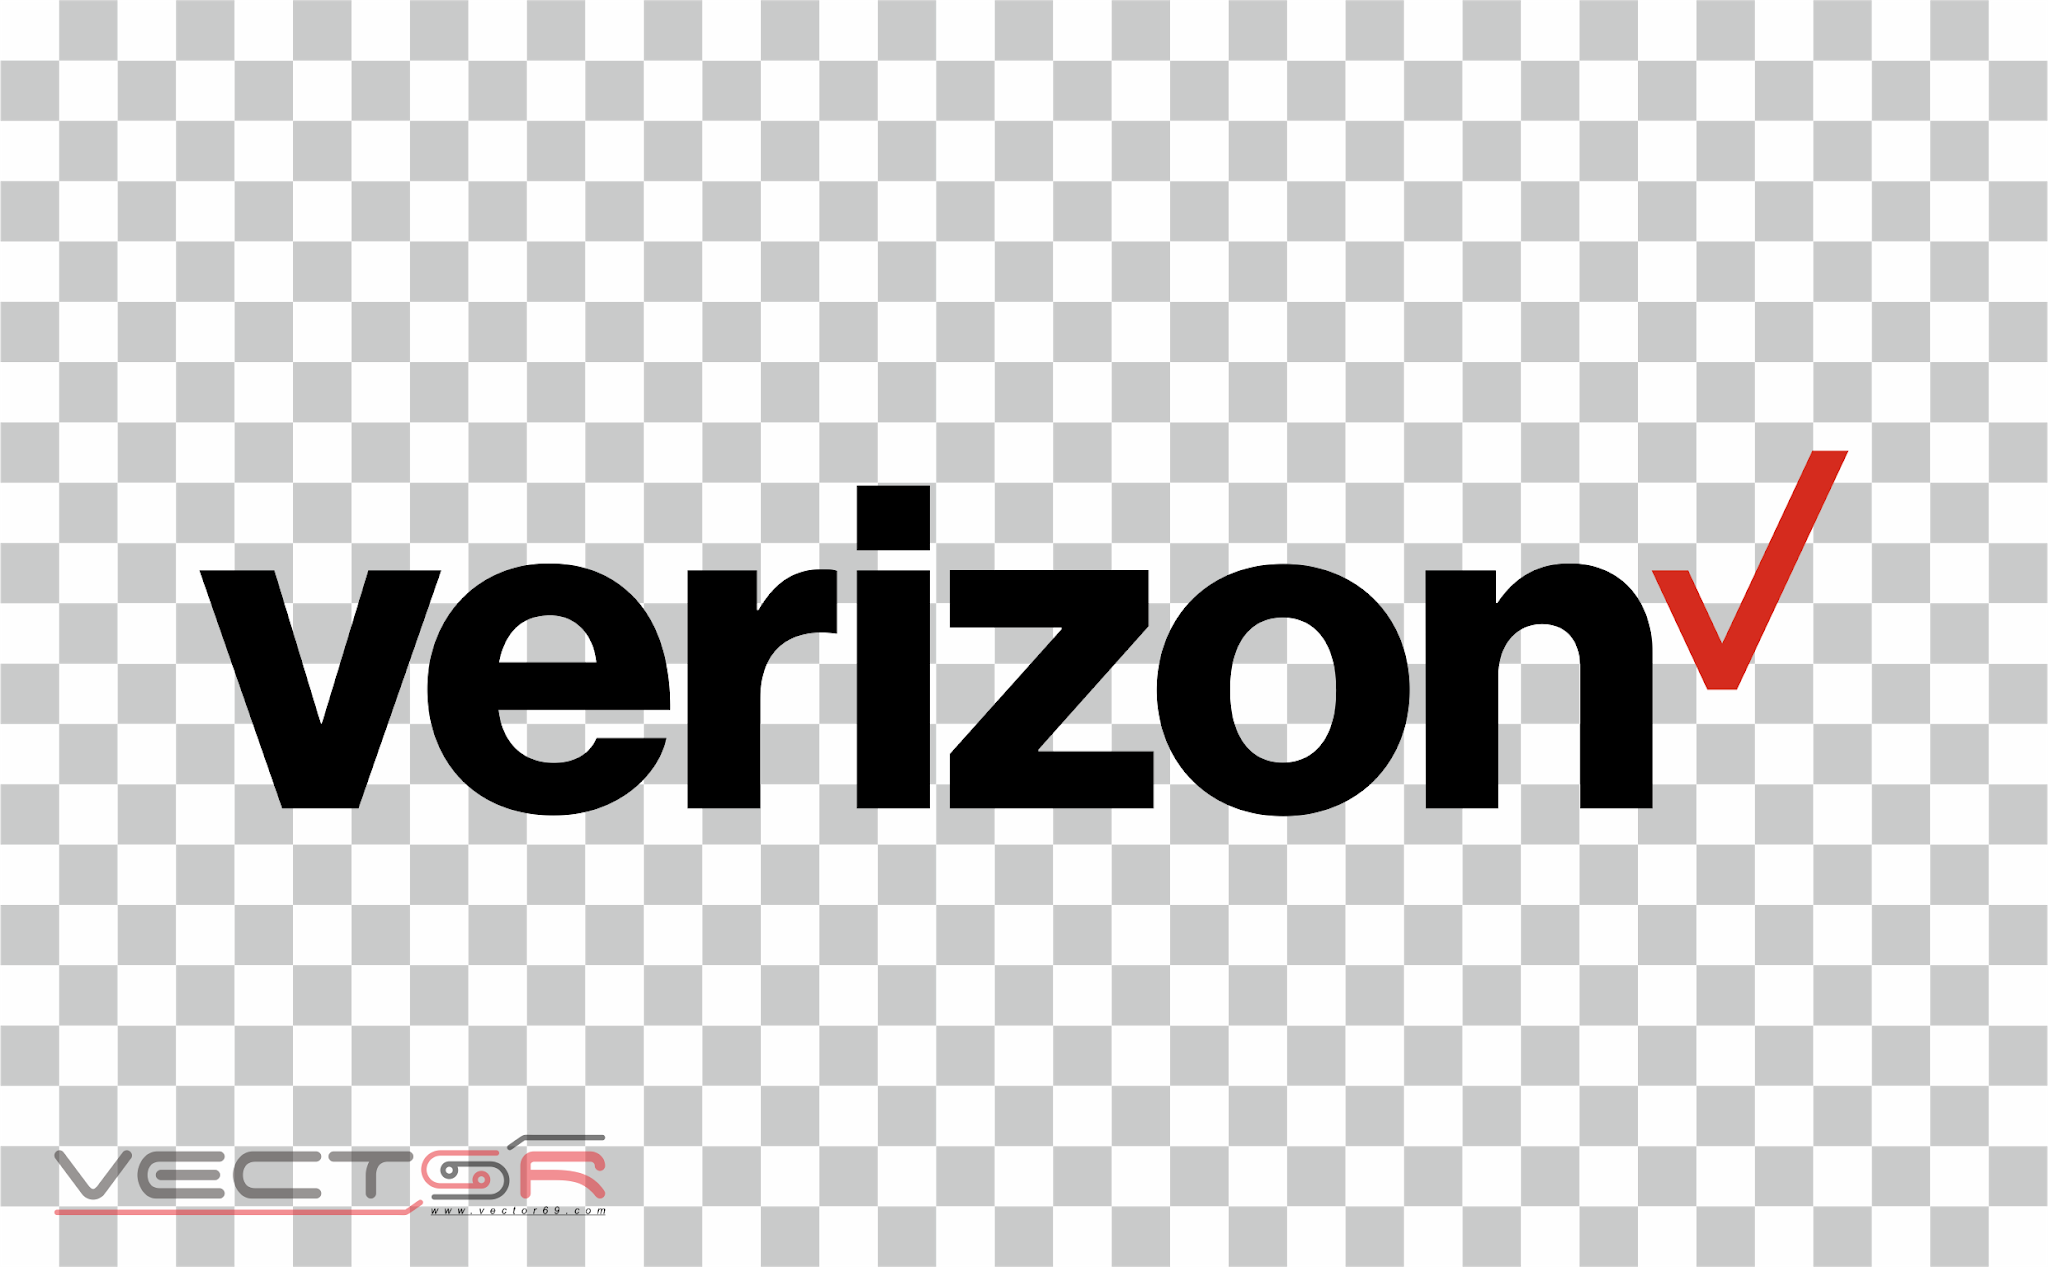 Verizon Logo - Download Vector File PNG (Portable Network Graphics)